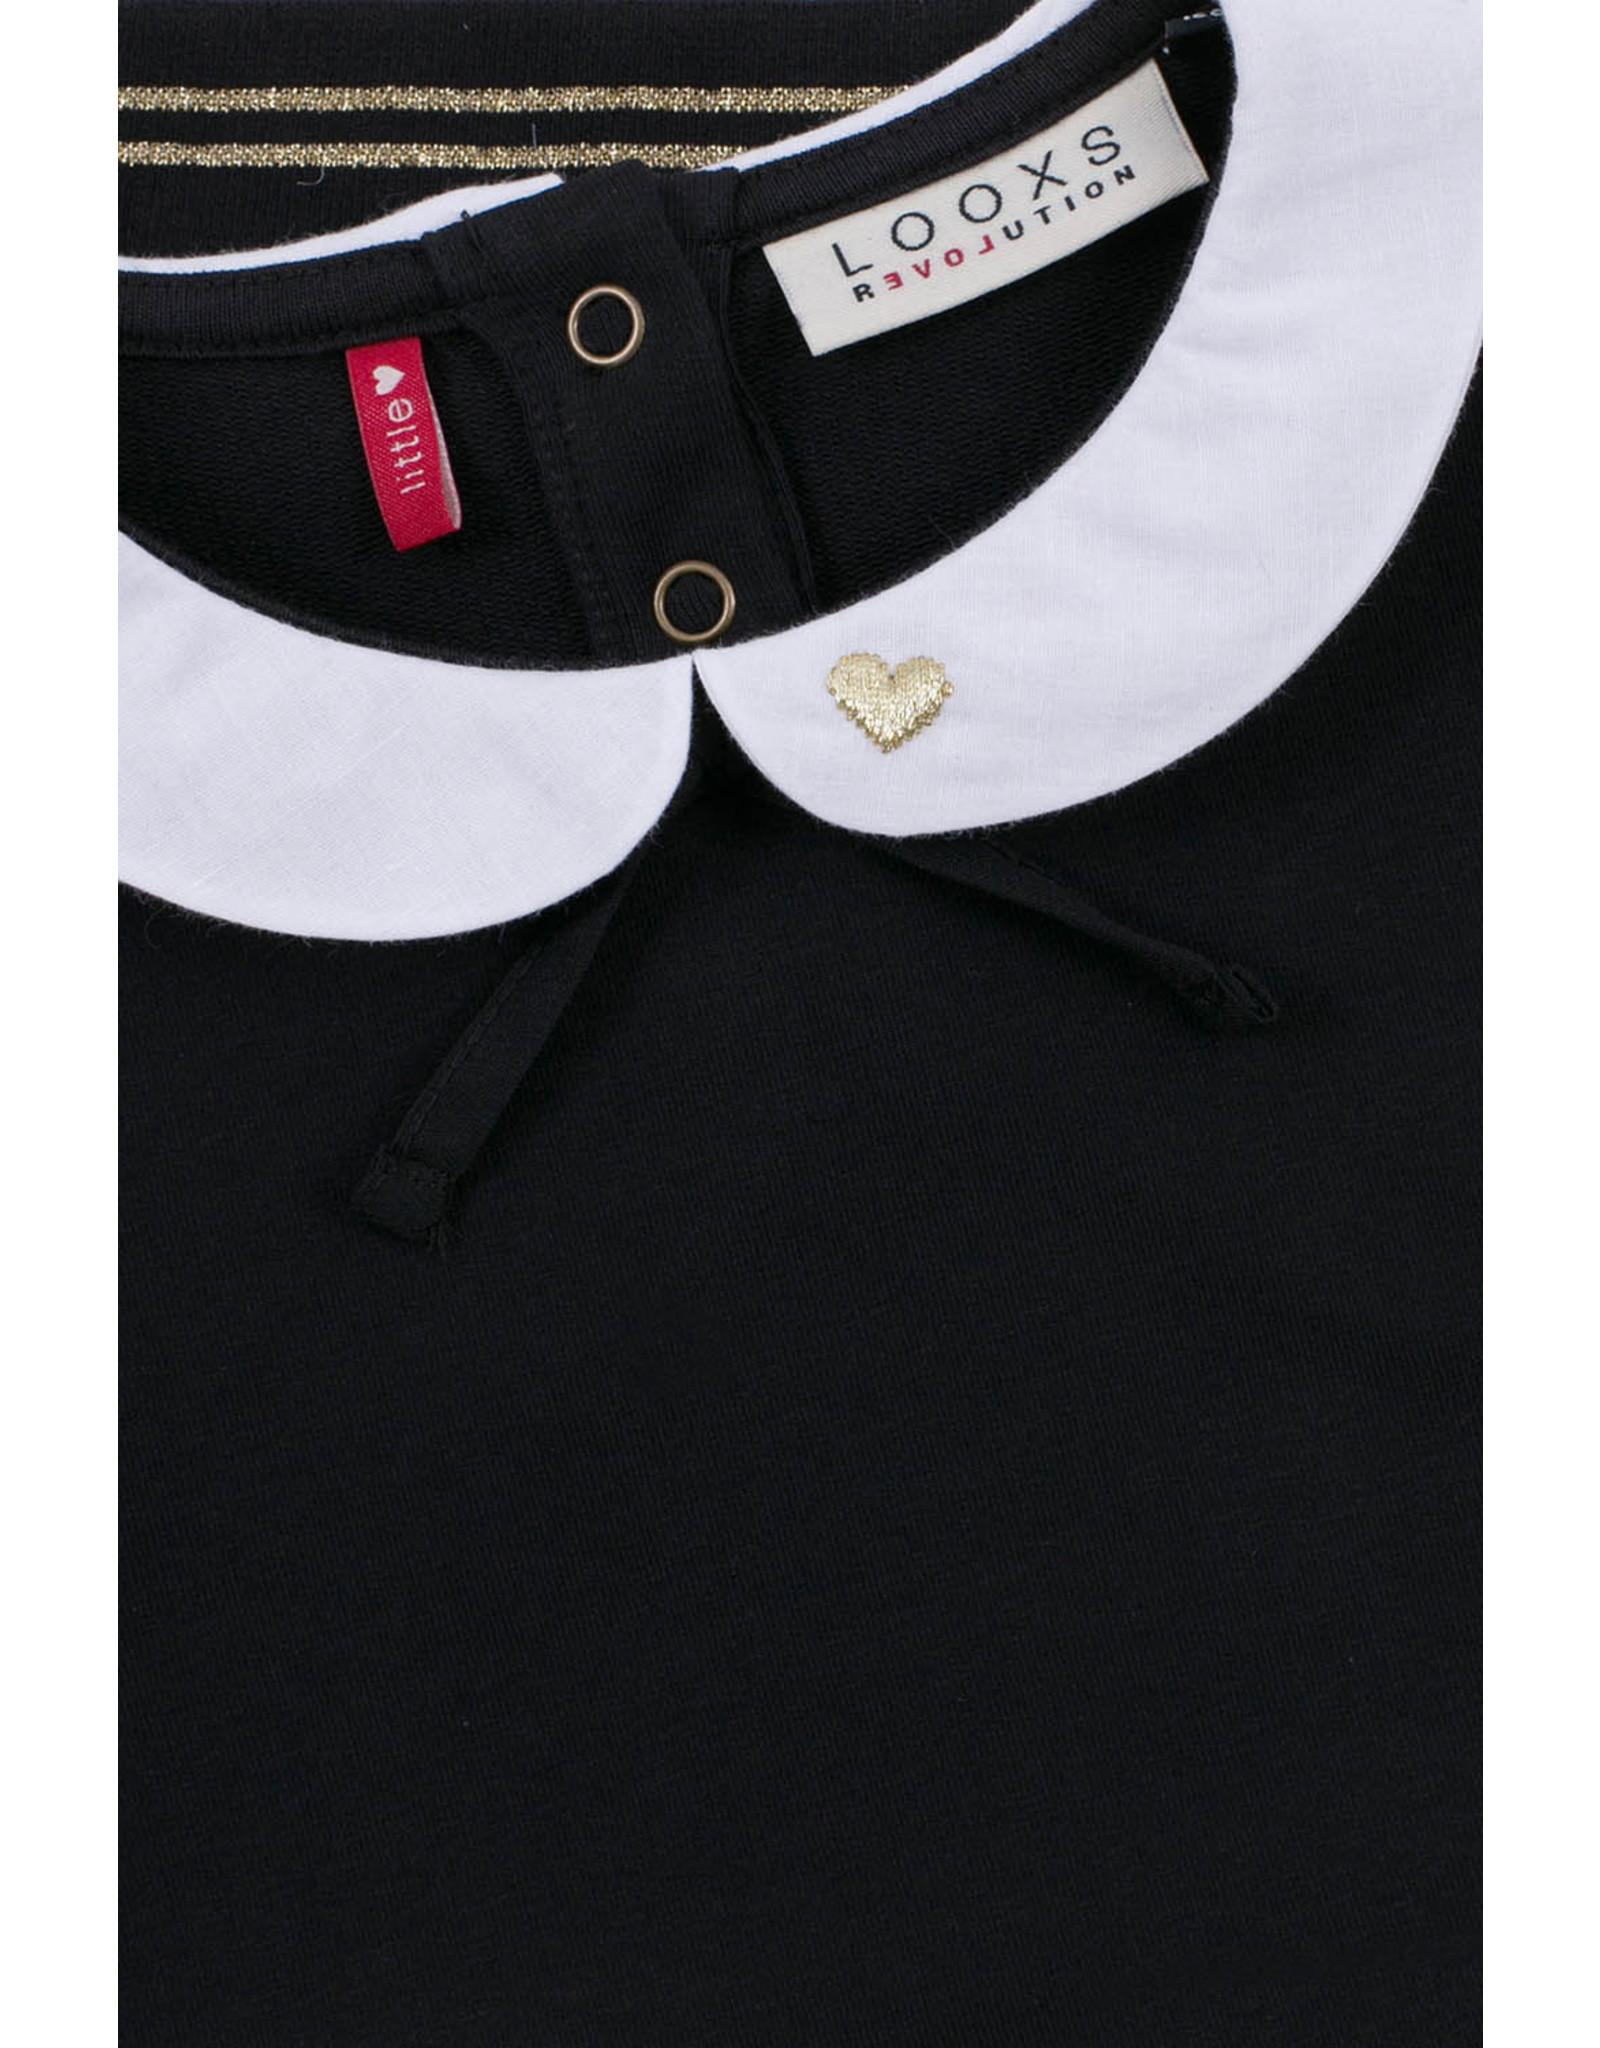 LOOXS Little Little collar sweater black